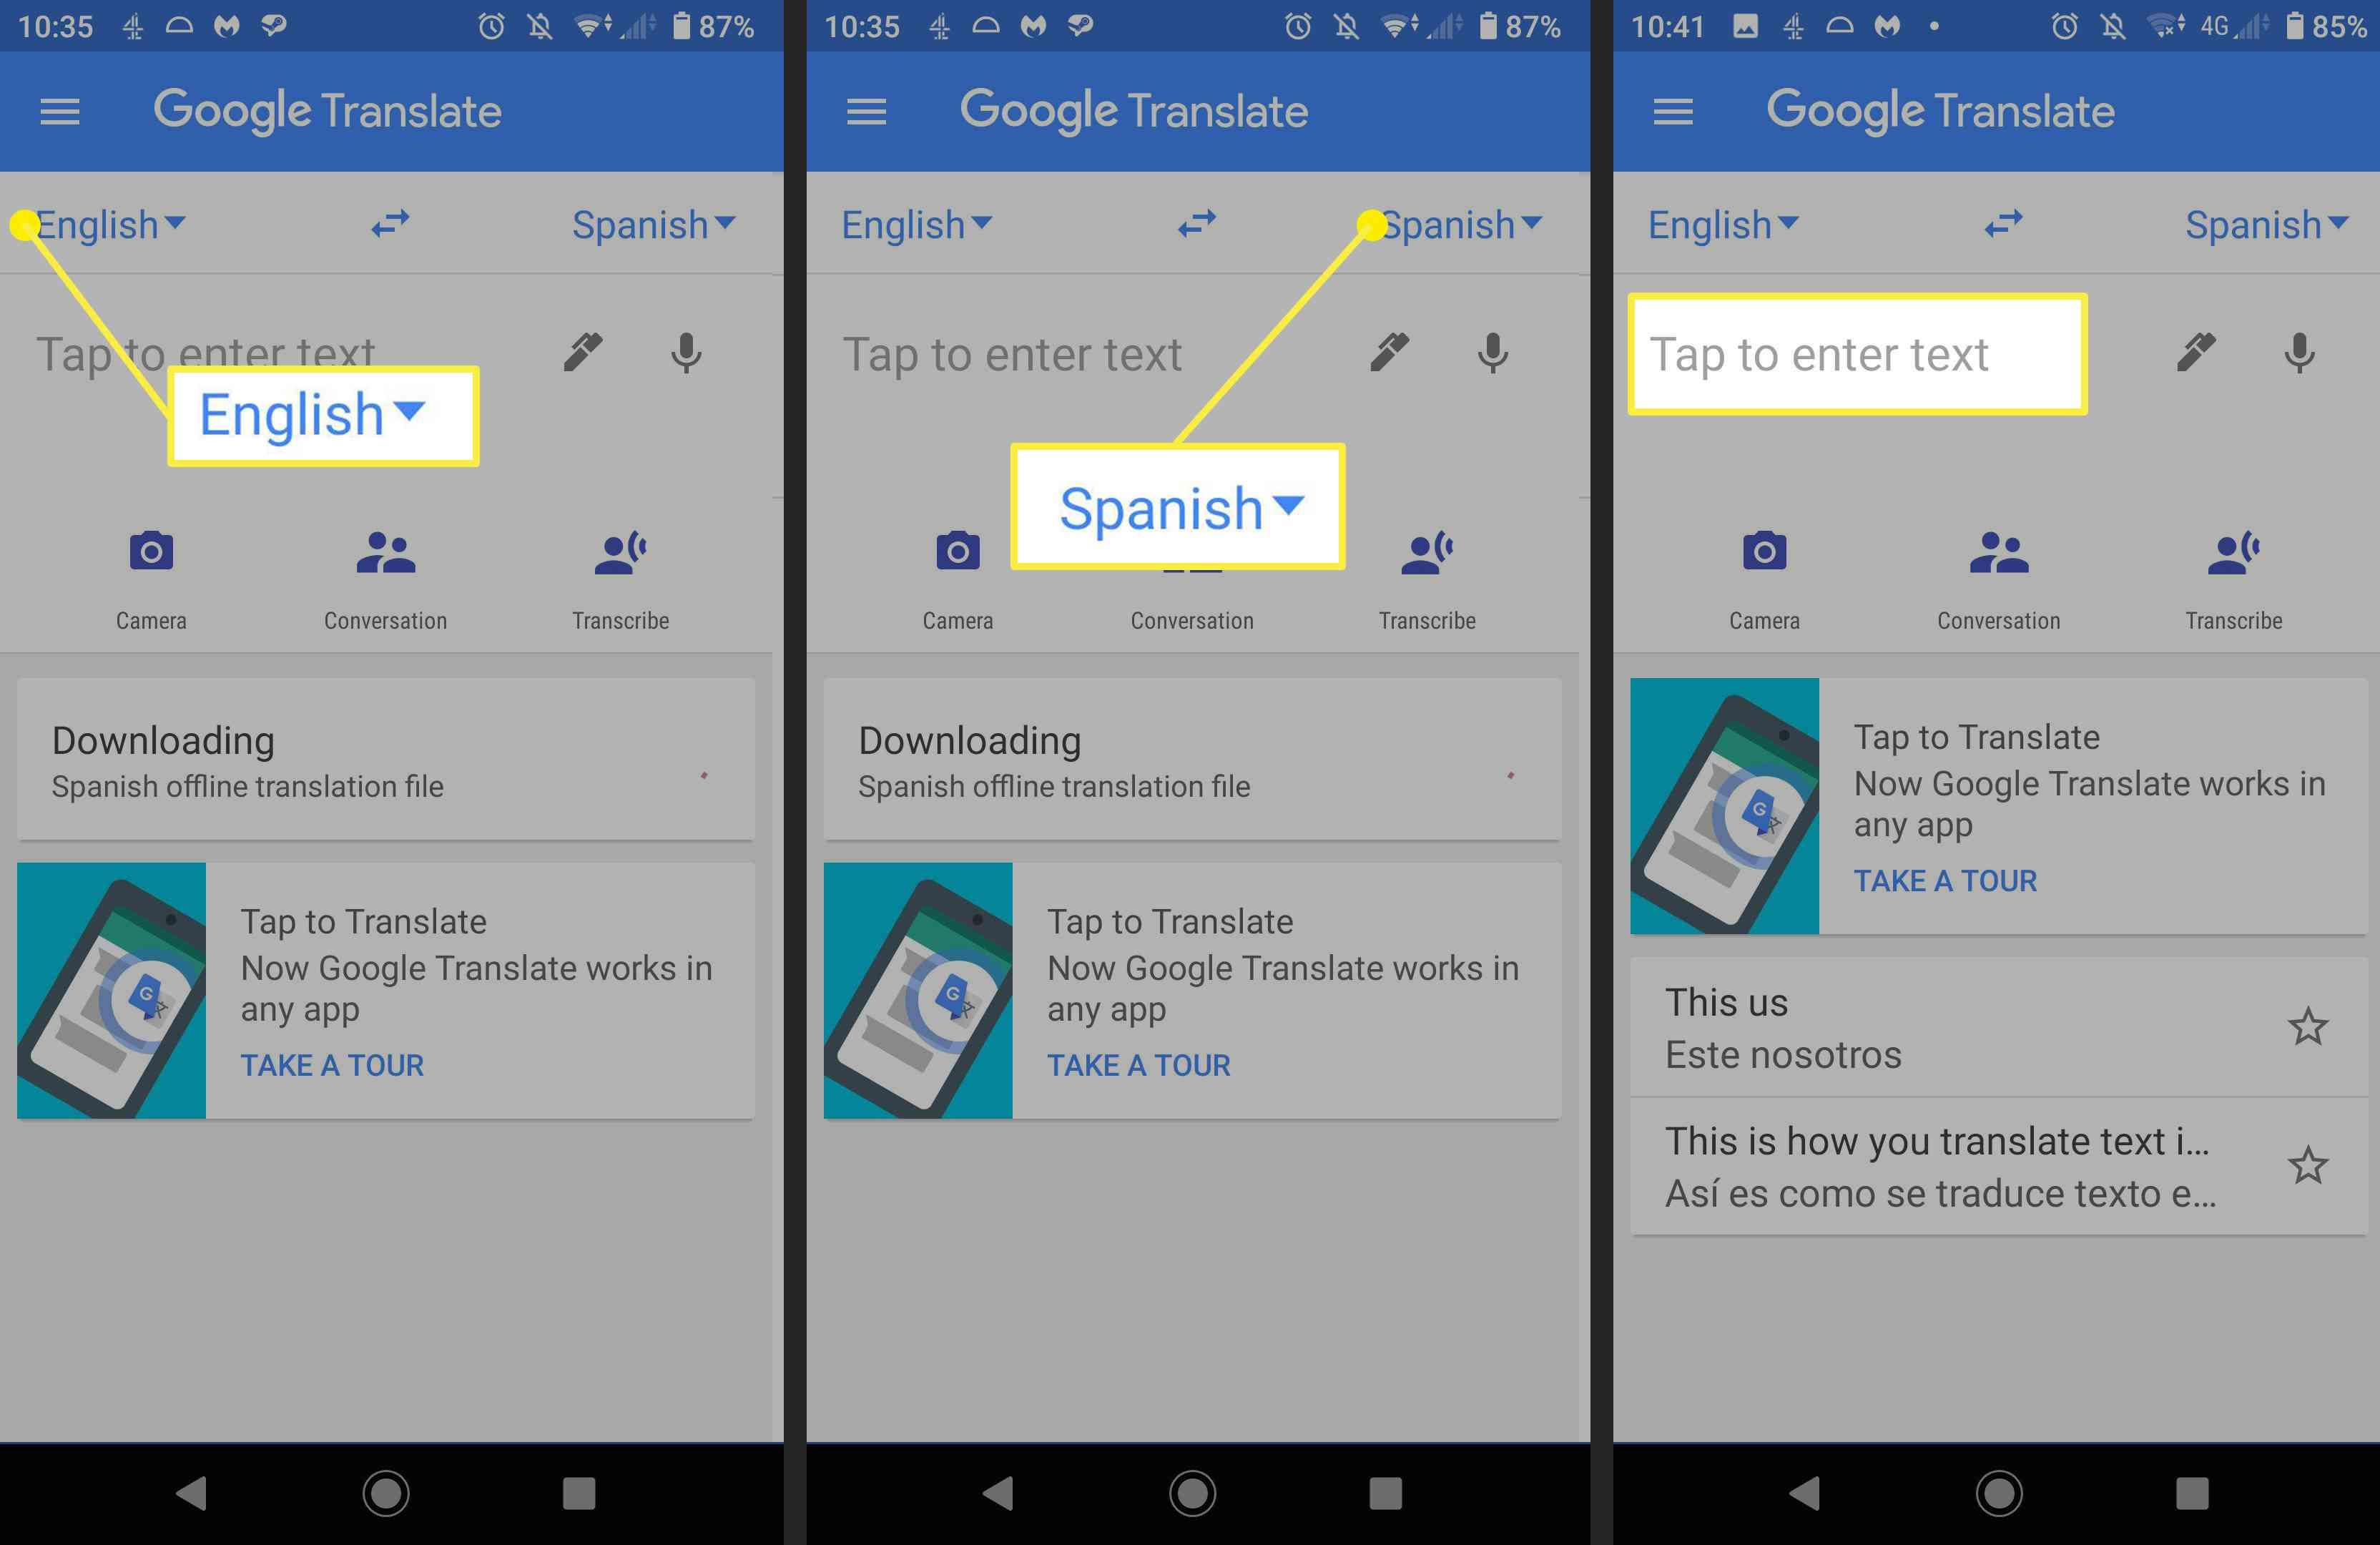 Screenshots showing how to use Google Translate.